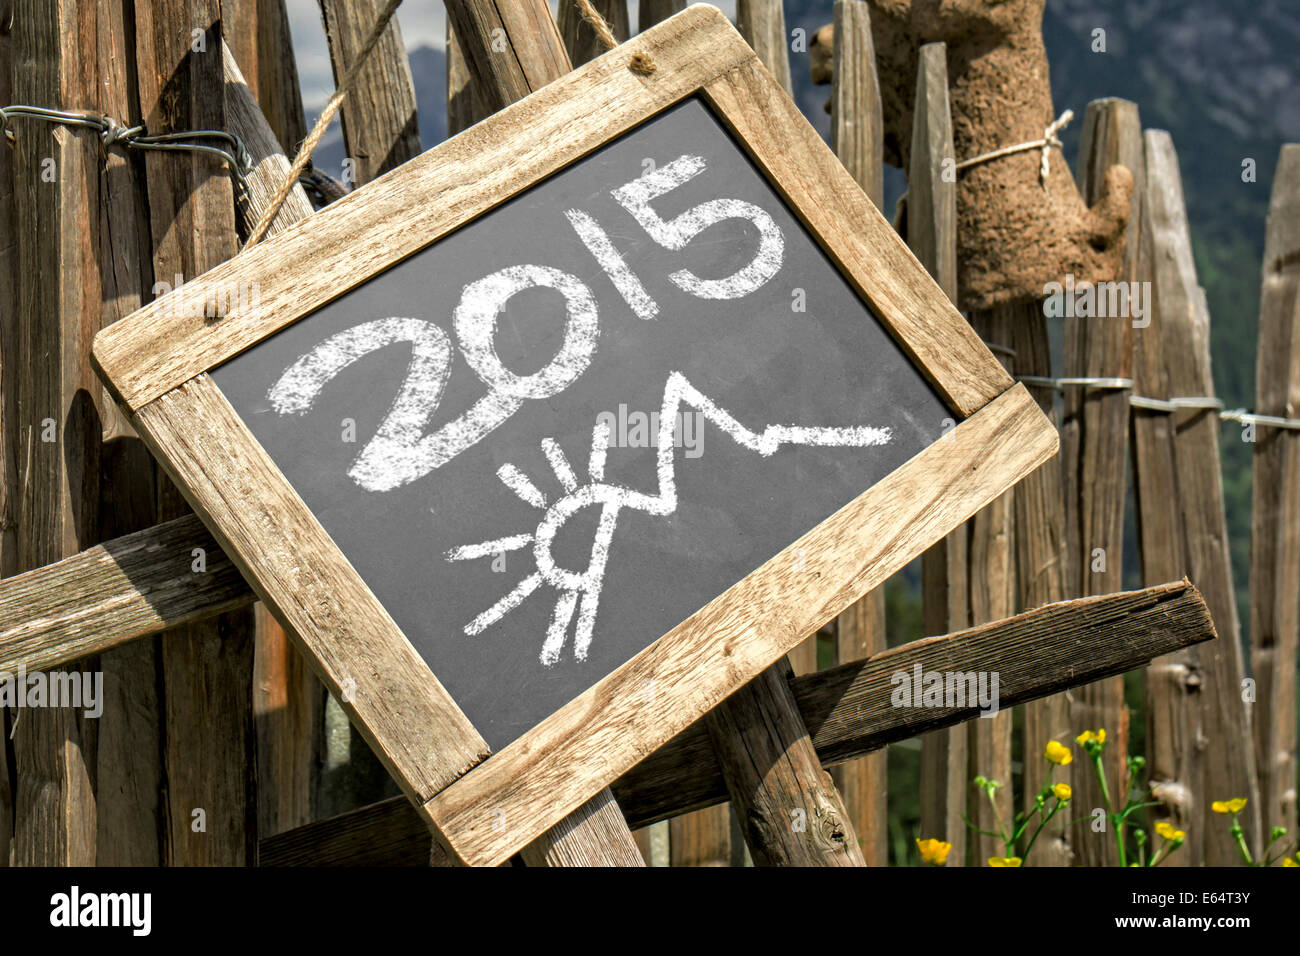 Hölzerne Palisade mit Tafel-Tipp-Panel. Tafel mit 2015 Datum Stockbild